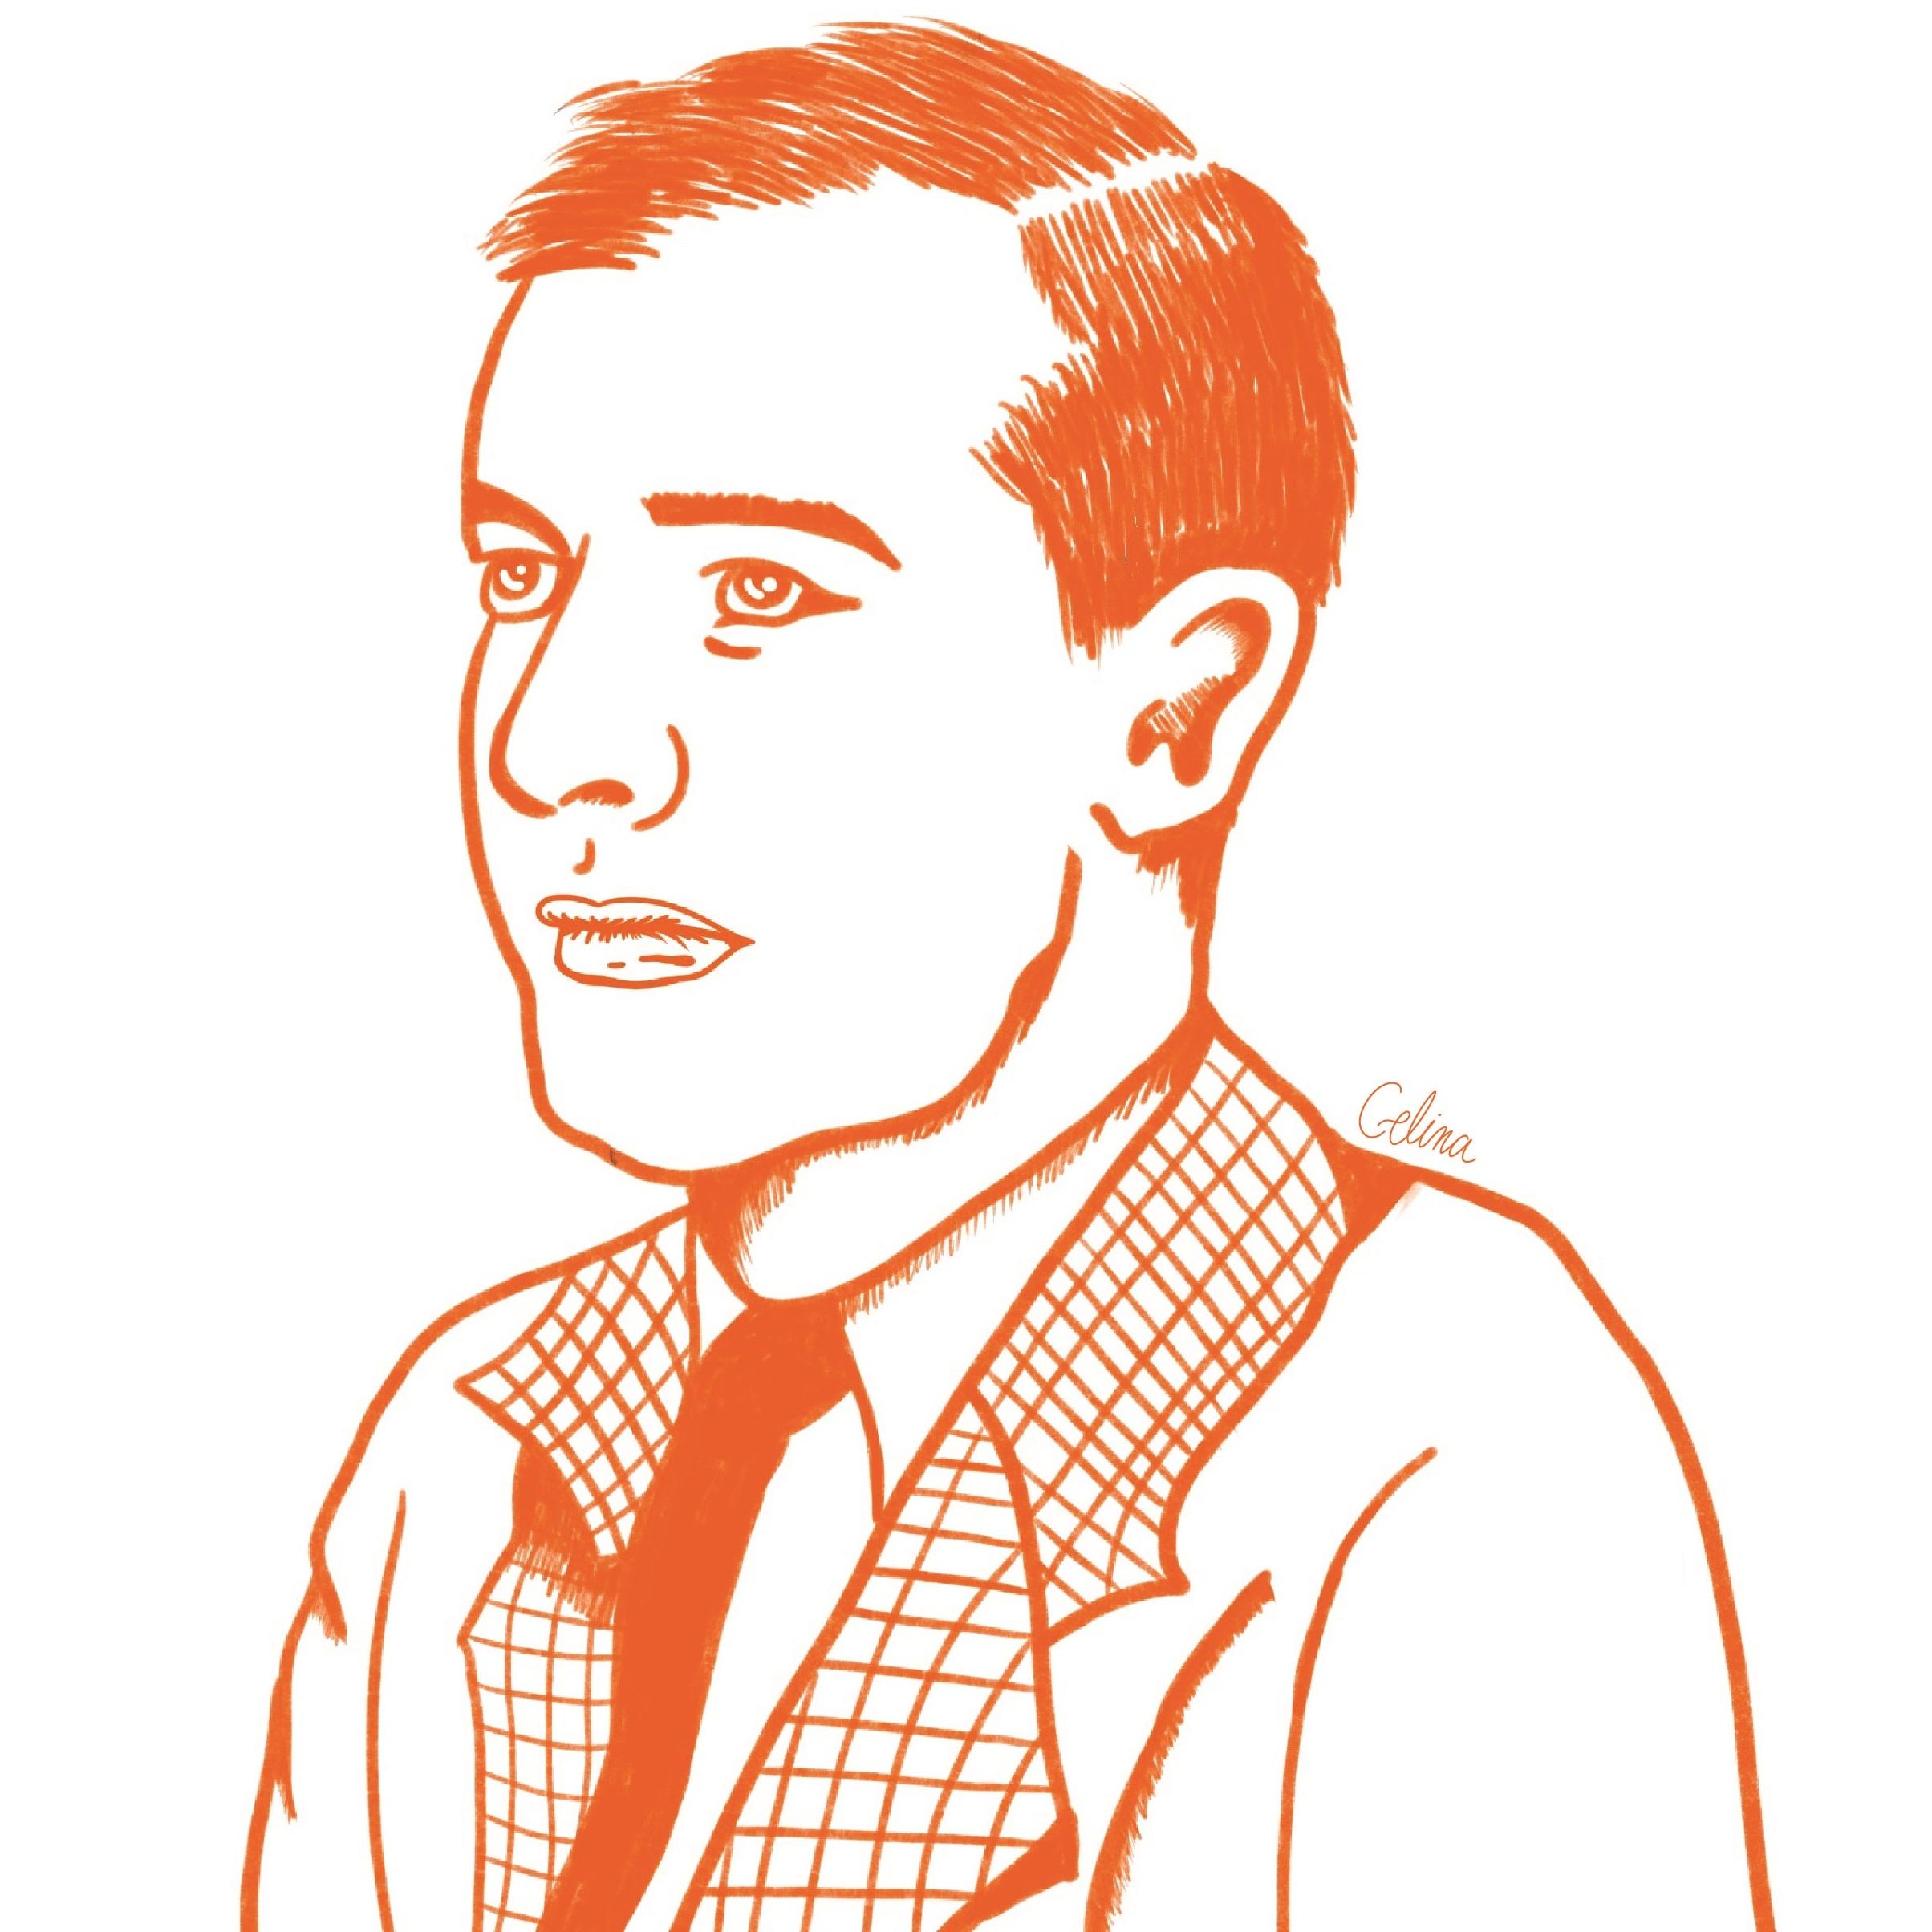 Illustration of Raoul Wallenberg